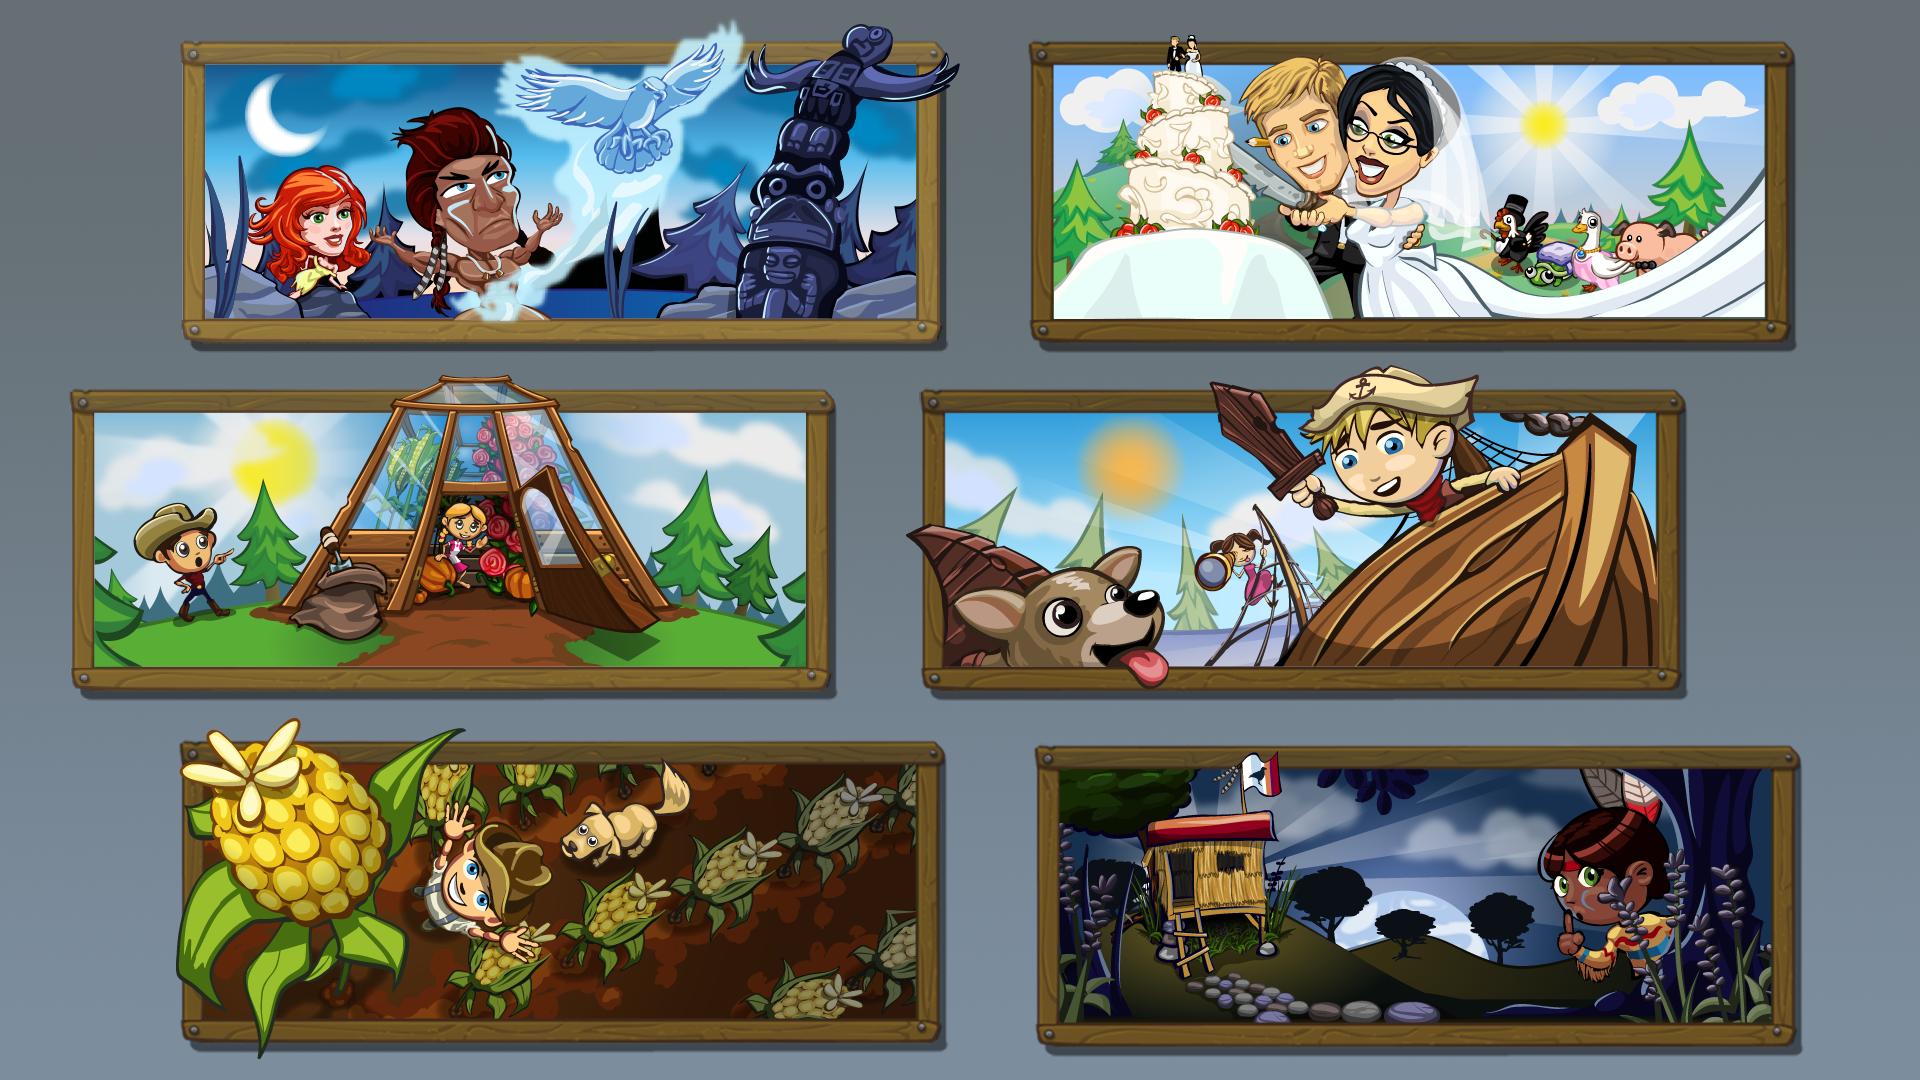 Pop up illustrations